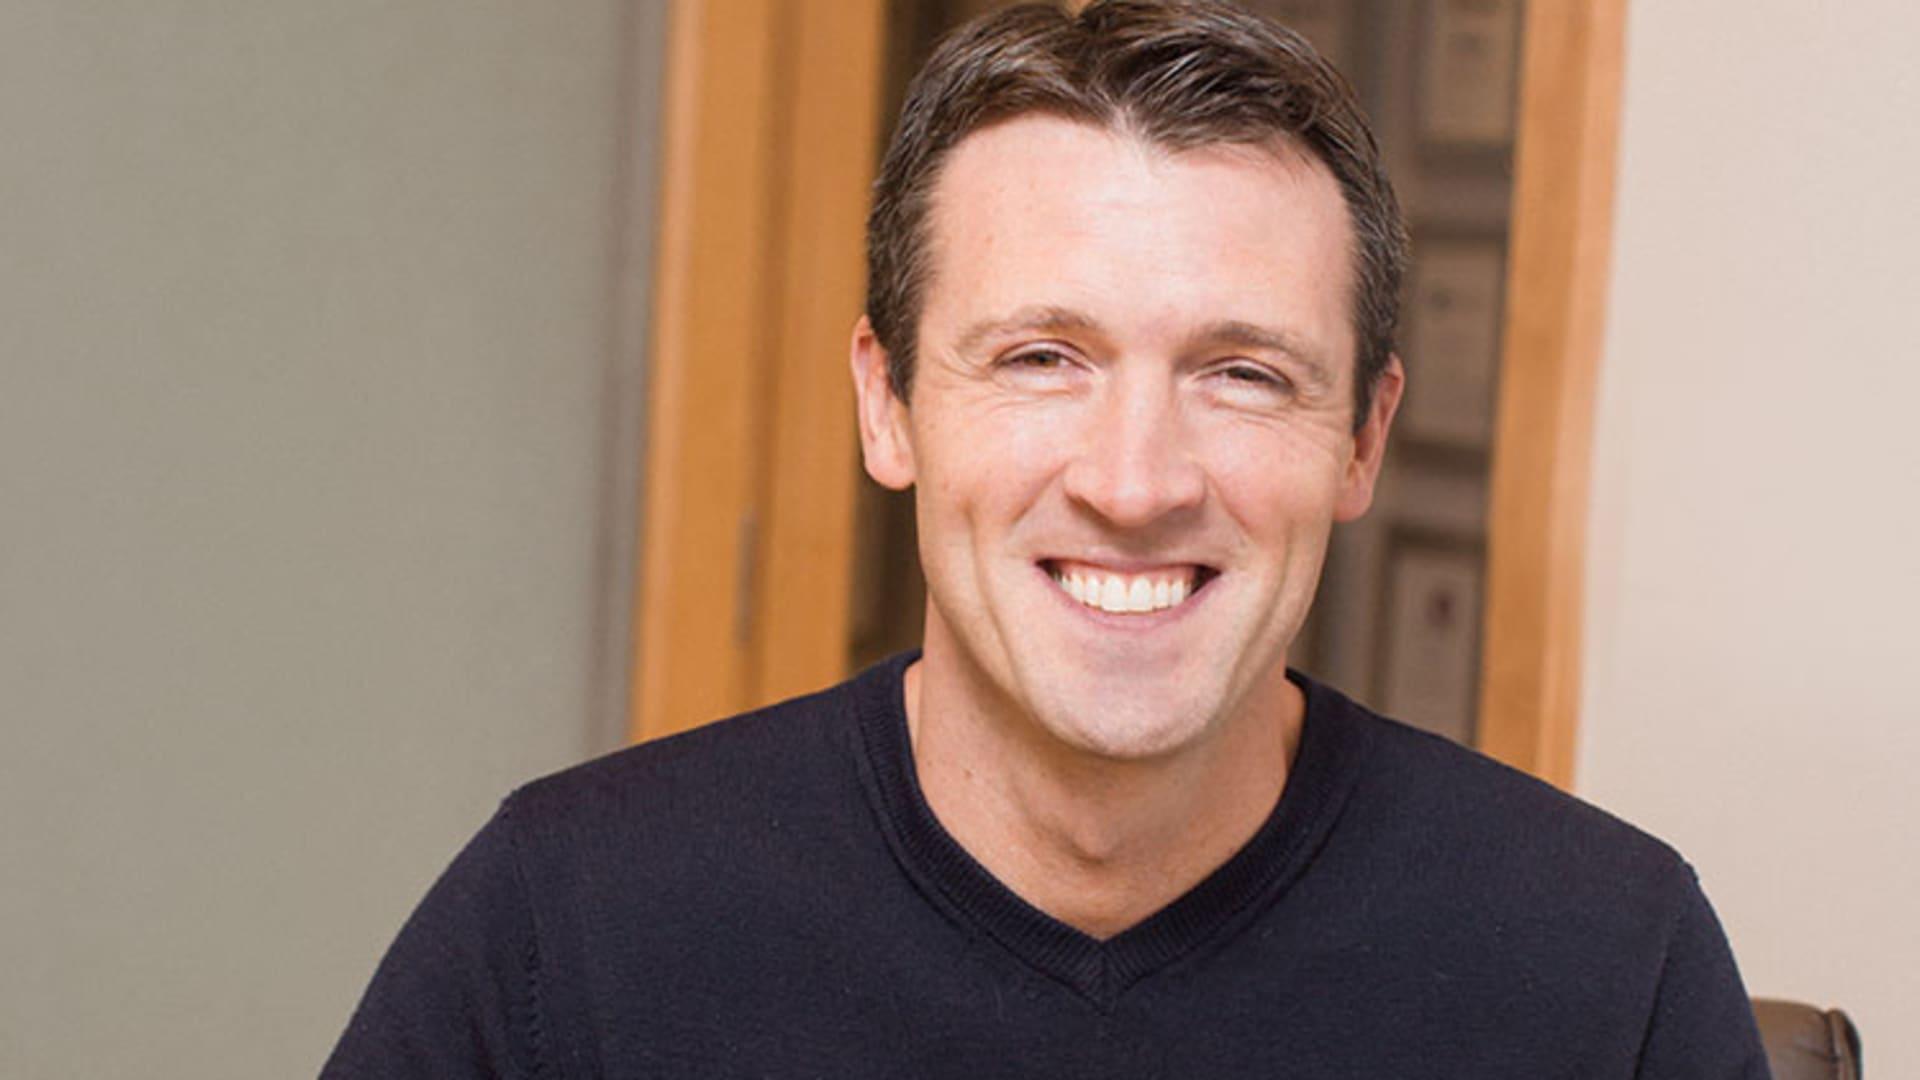 Shawn Carolan, Menlo Ventures partner